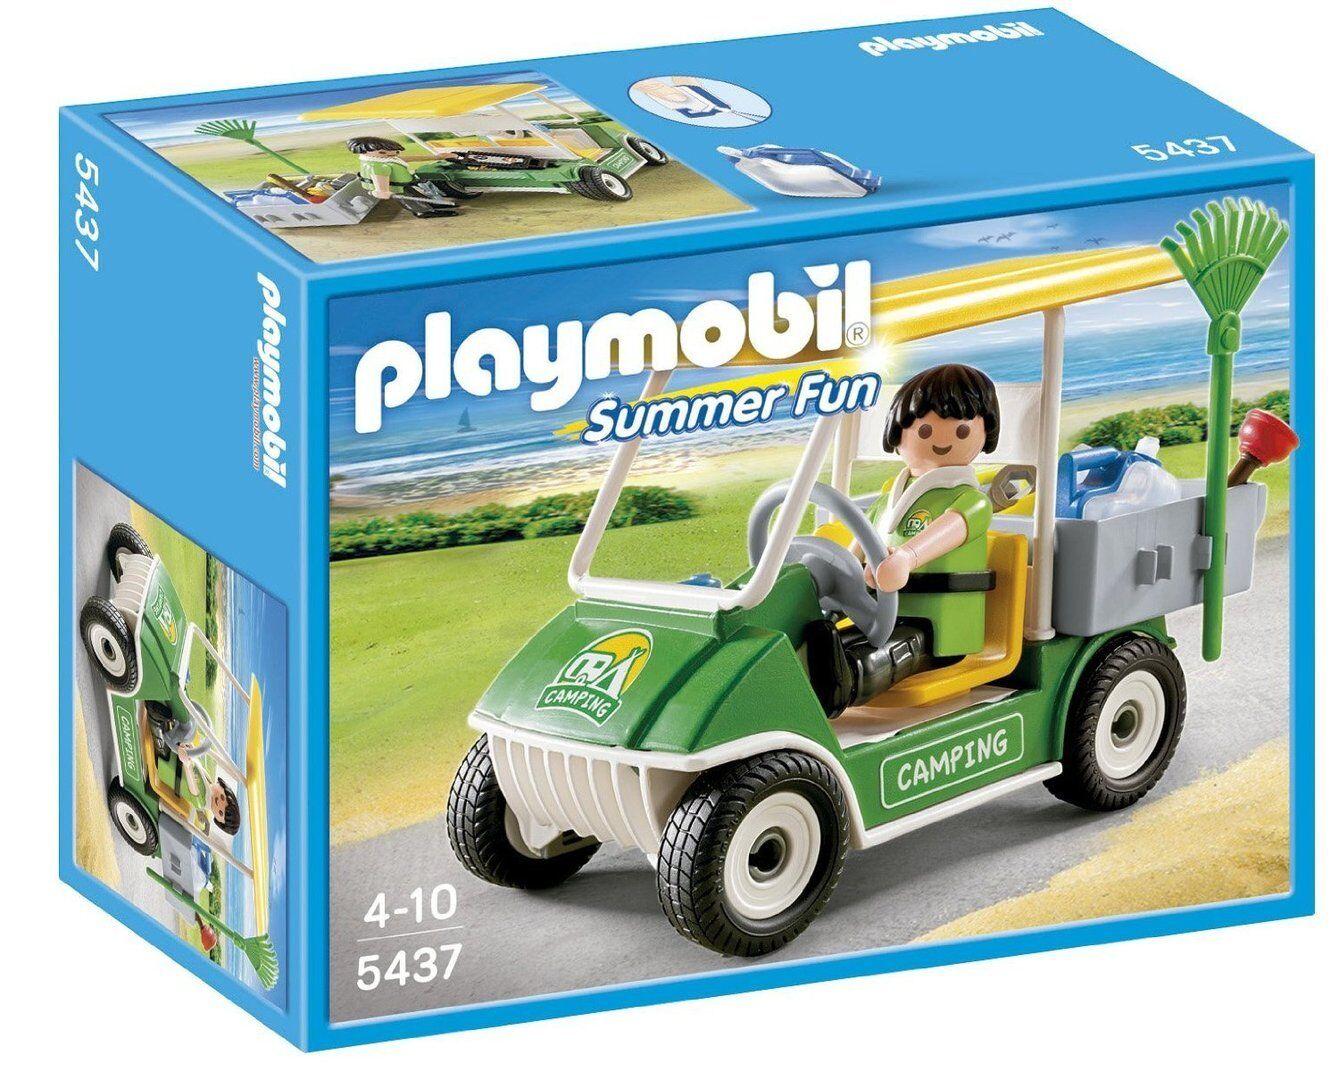 Playmobil 5437 - Carrito de camping - NUEVO